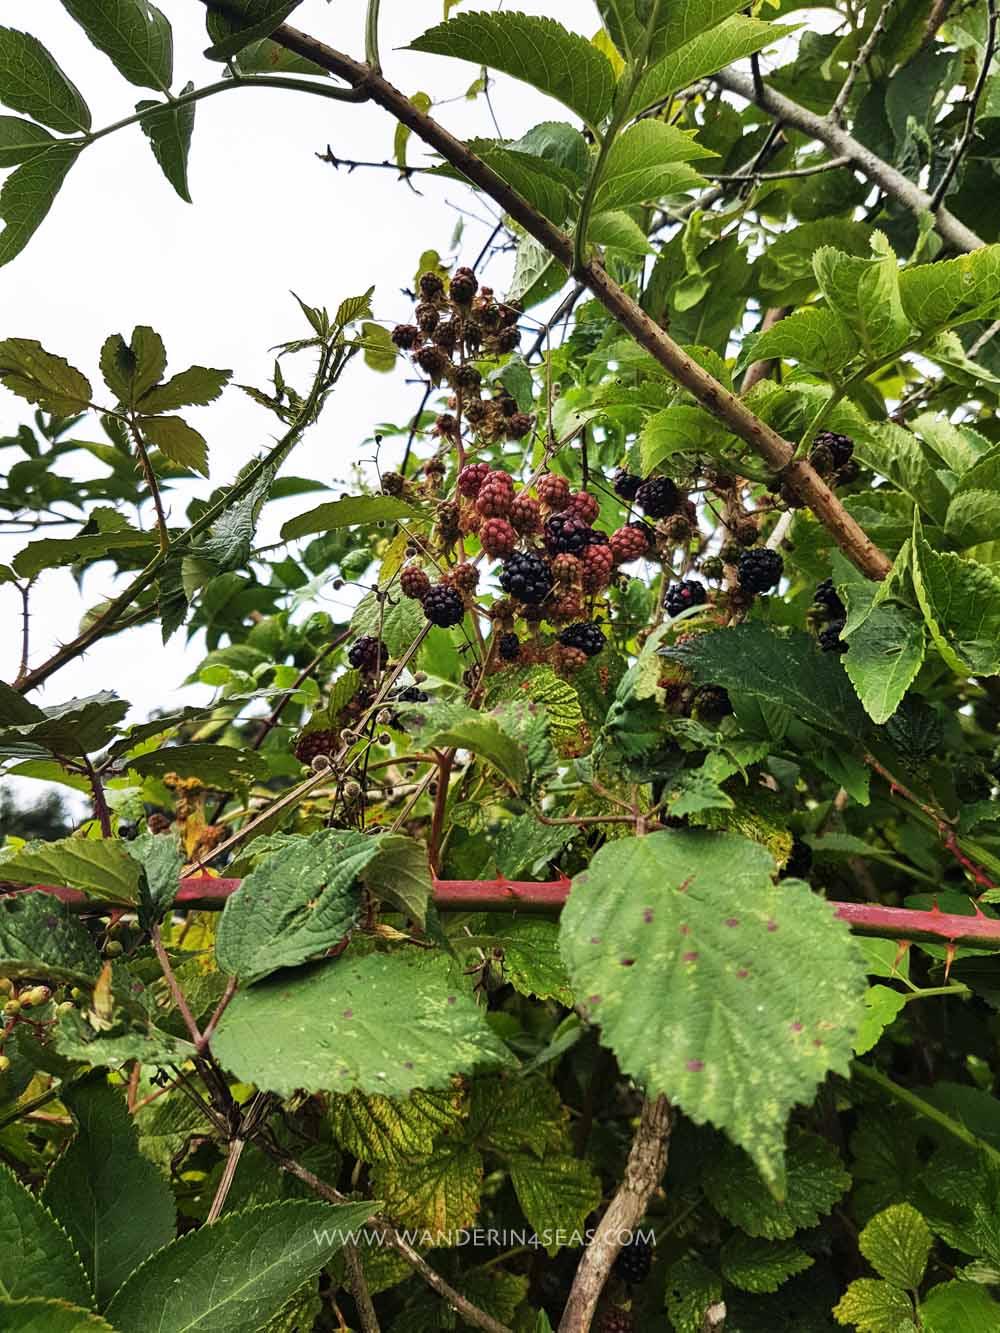 Sumptuous black berries